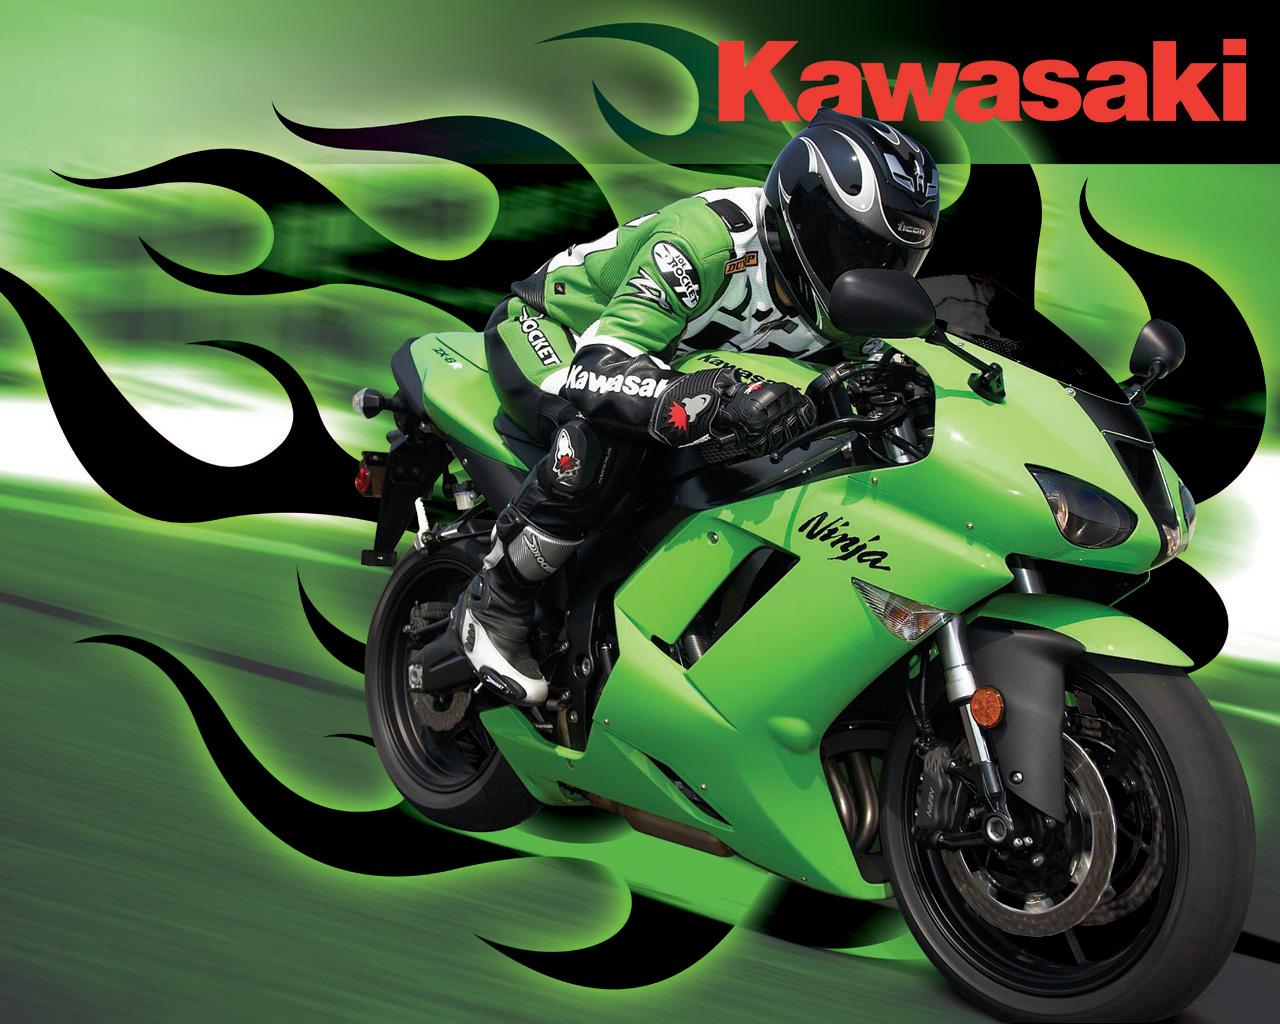 http://1.bp.blogspot.com/_VVjvOm2UBSI/TTYdrp7J-fI/AAAAAAAAAZc/dQbXzFV2oV4/s1600/Kawasaki_Ninja_XZ_6R_2007_by_djog.jpg